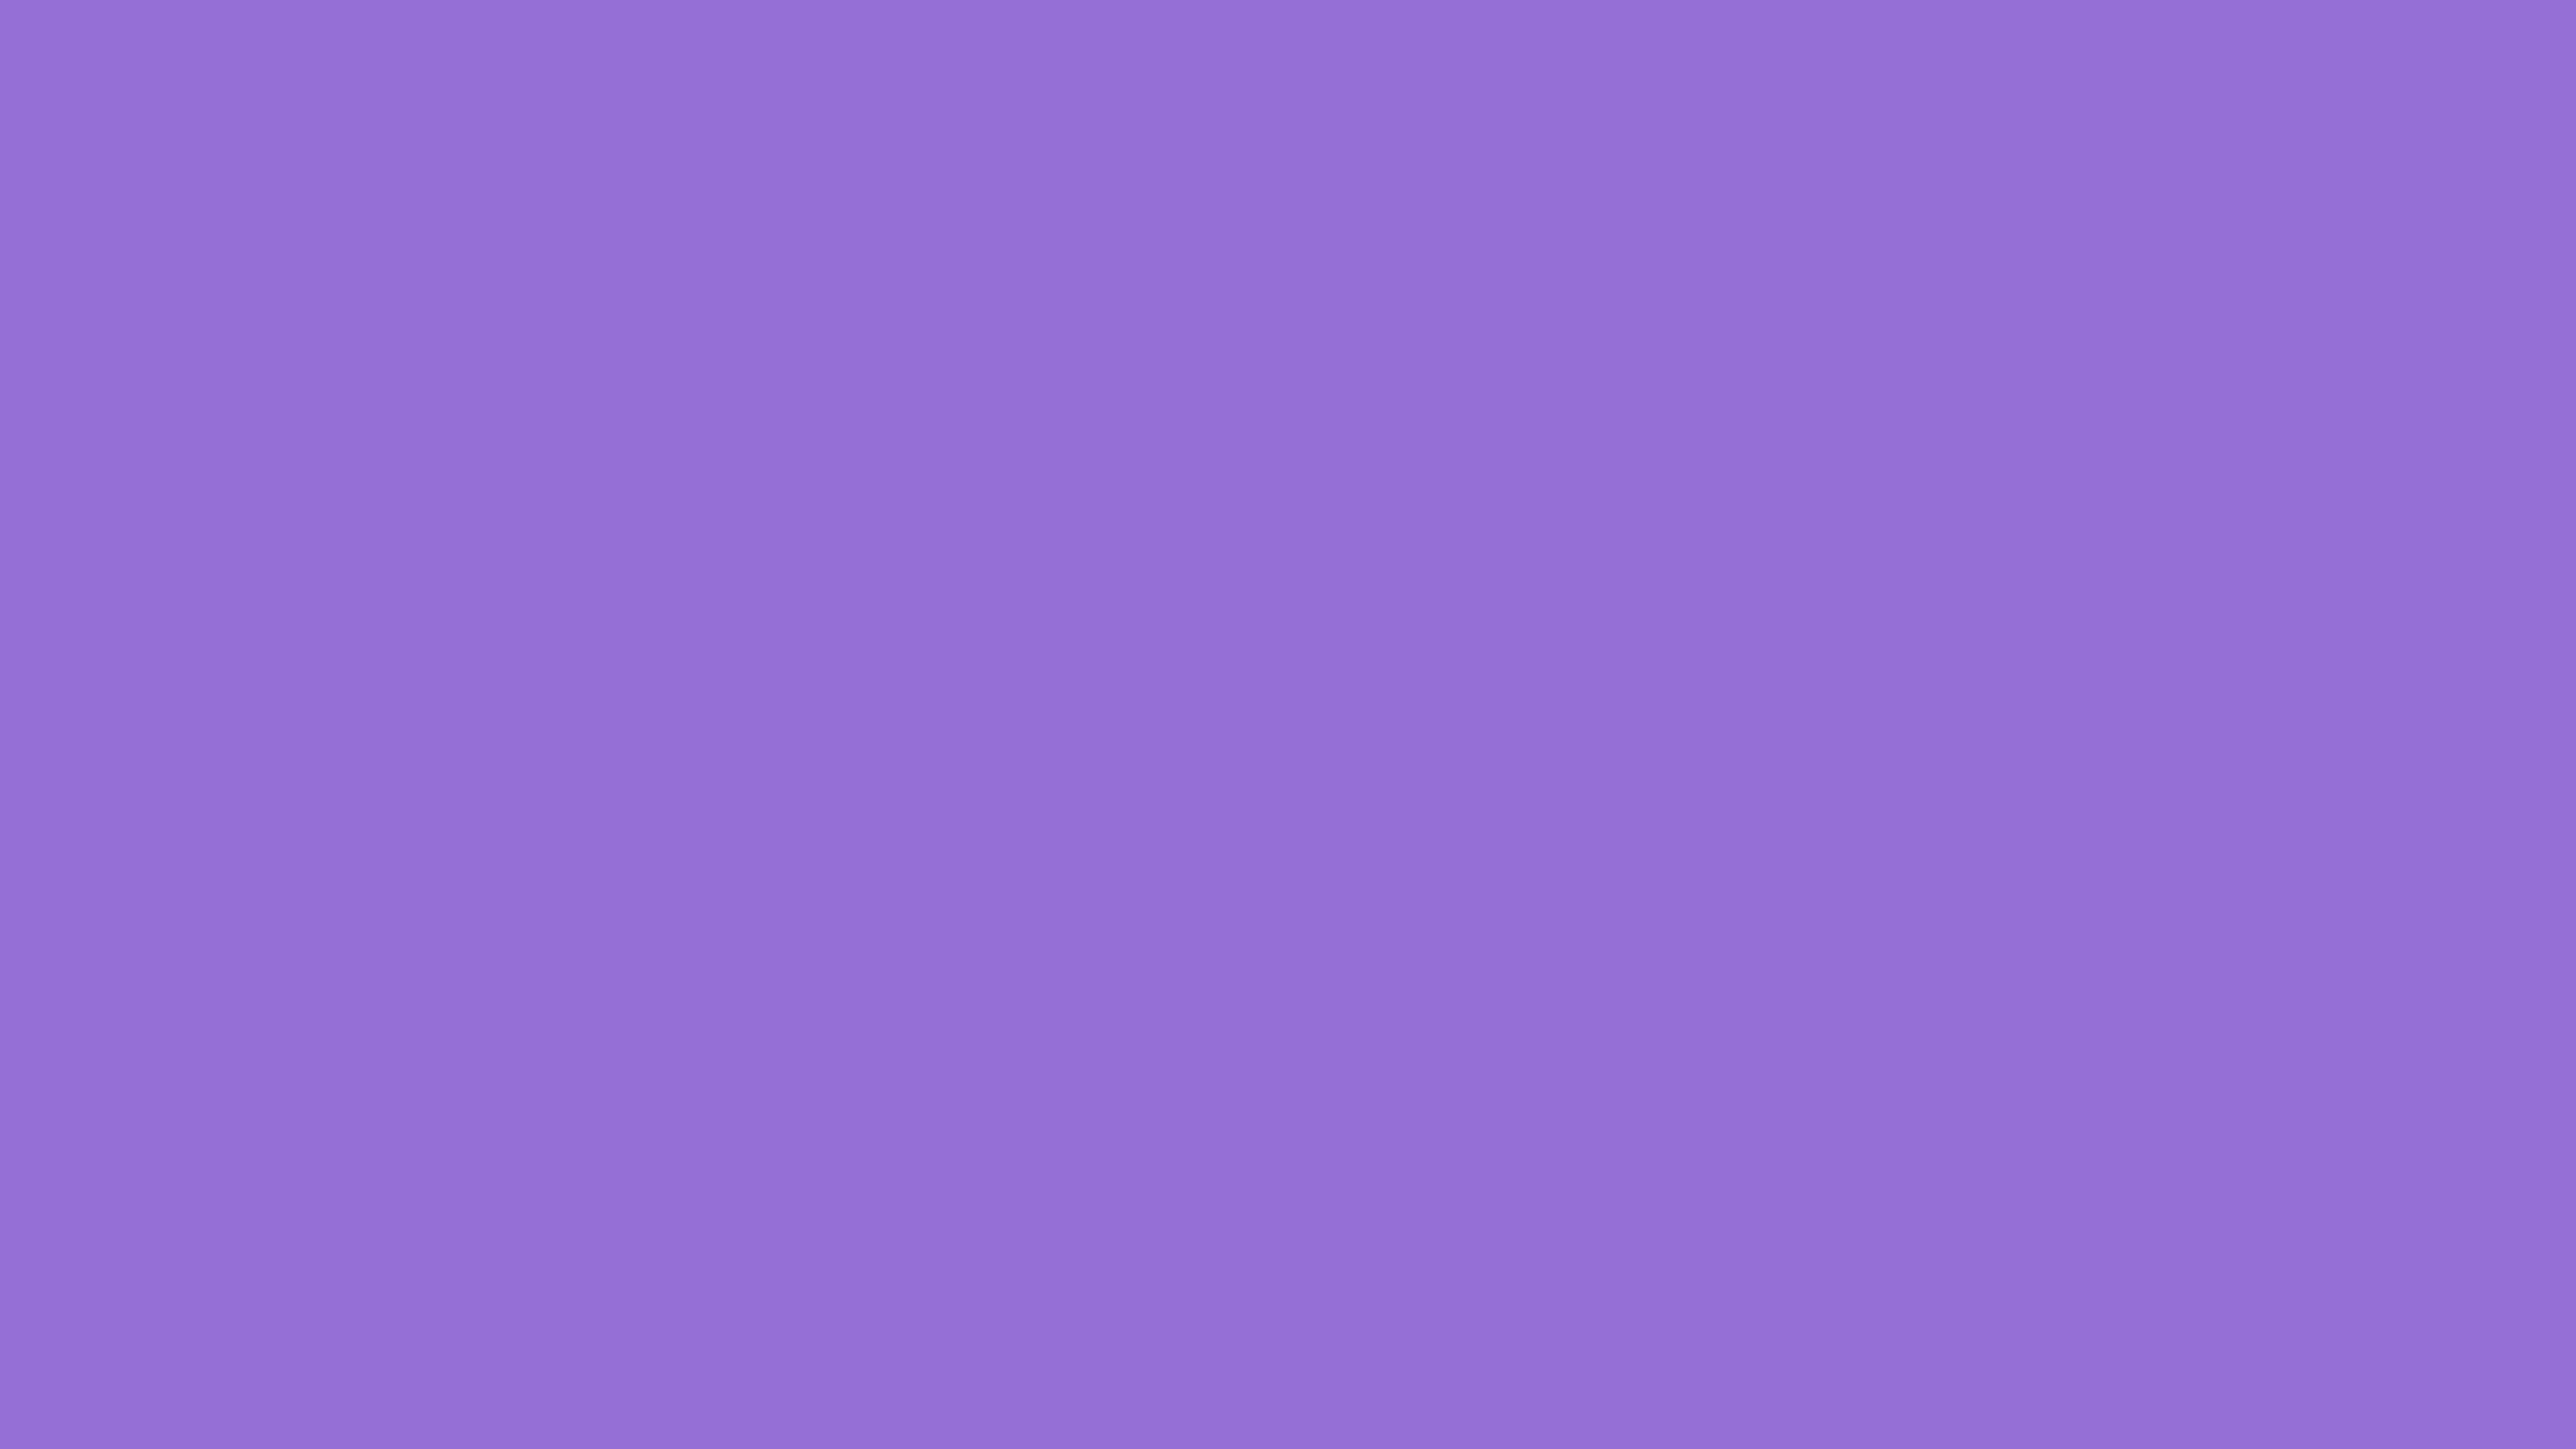 5120x2880 Dark Pastel Purple Solid Color Background